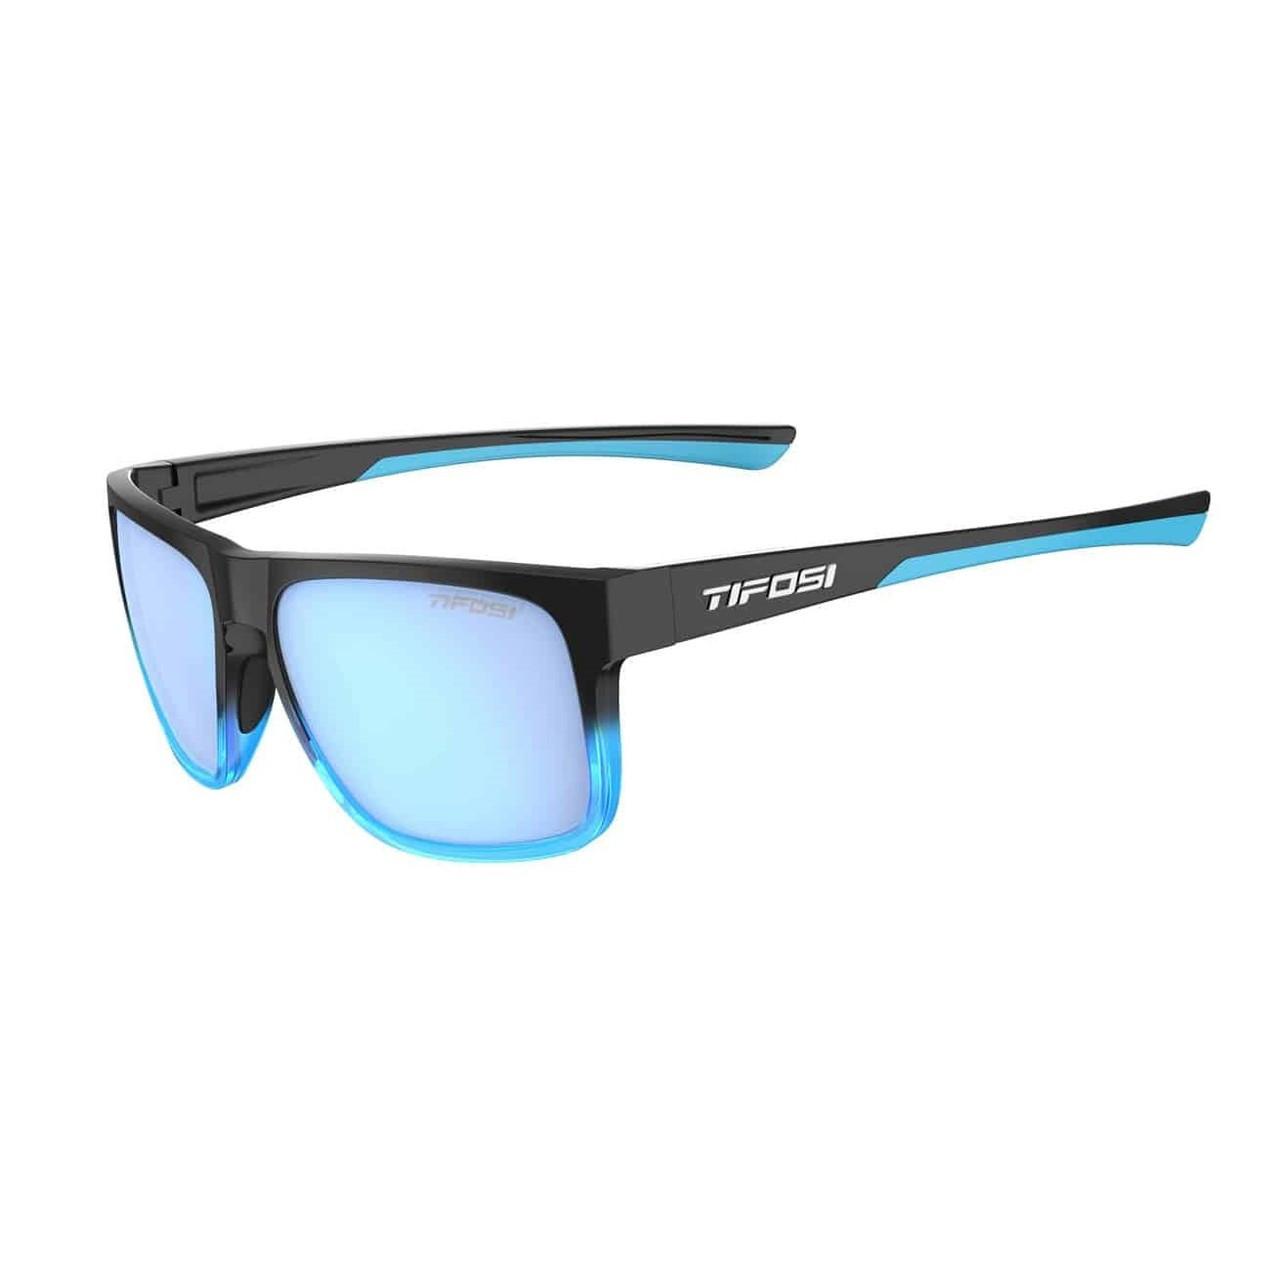 Tifosi Optics Swick Sunglasses - 2019 price